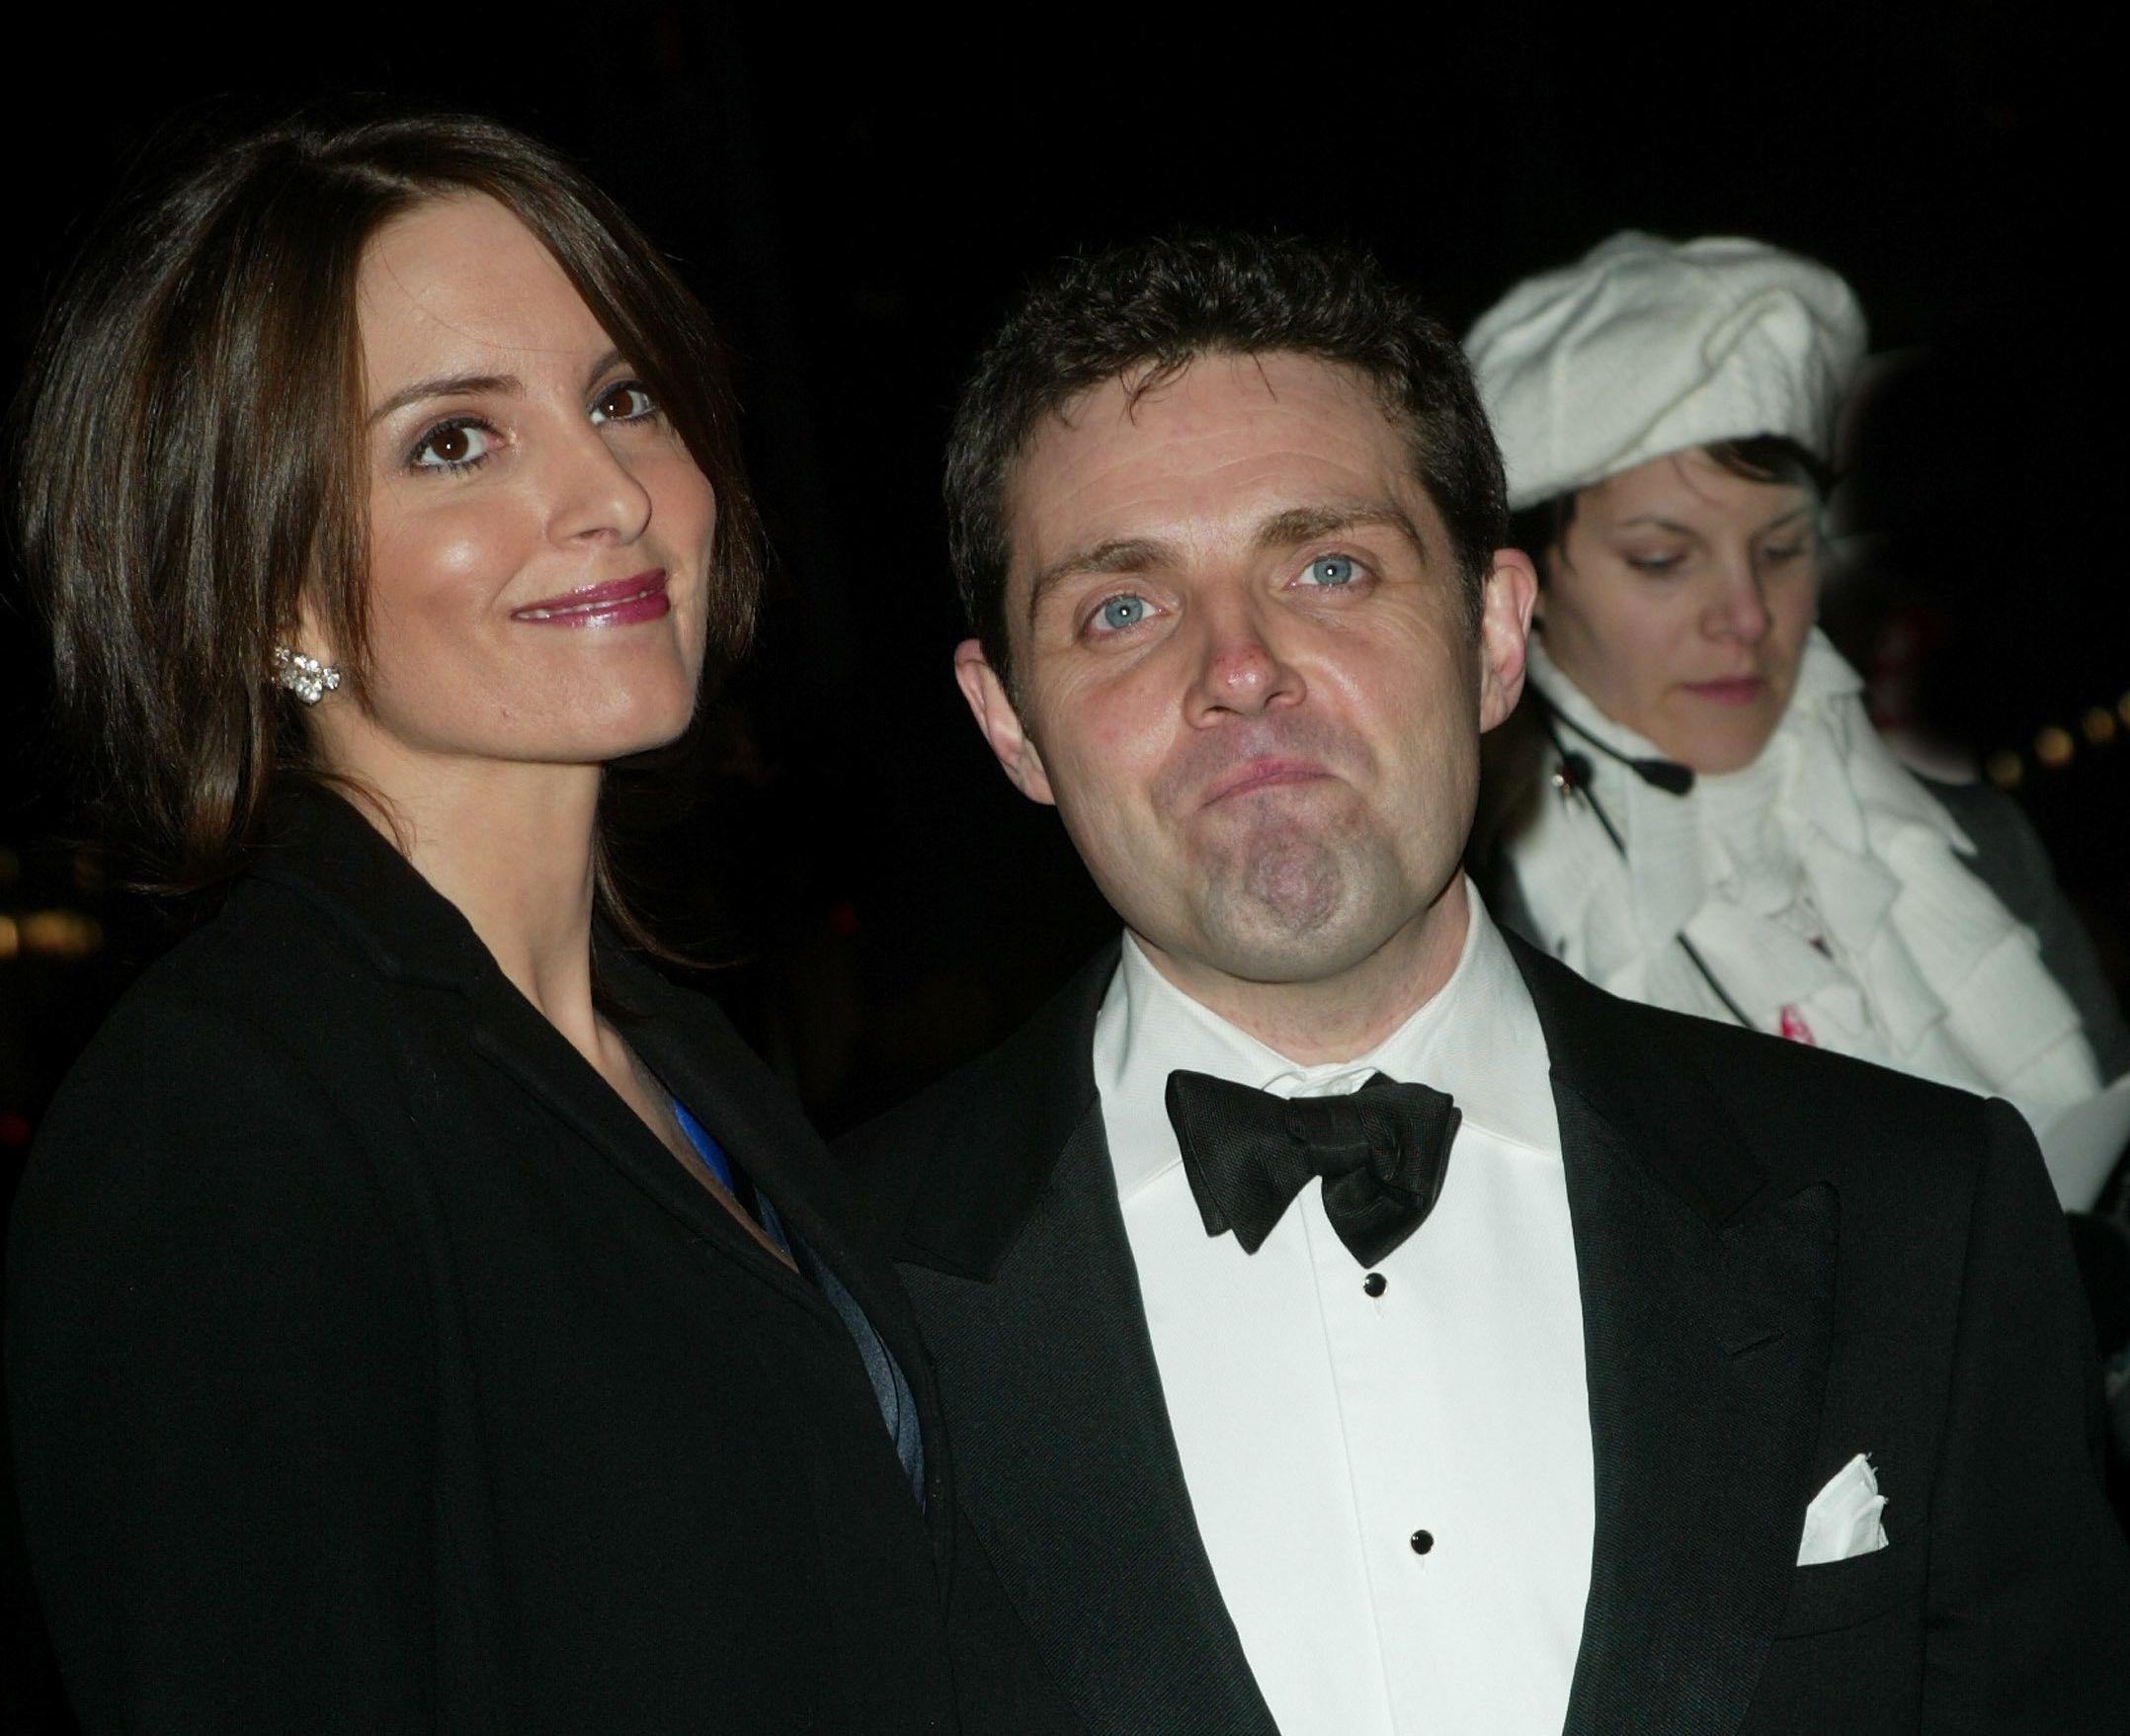 Tina Fey and husband Jeff Richmondat a benefit in